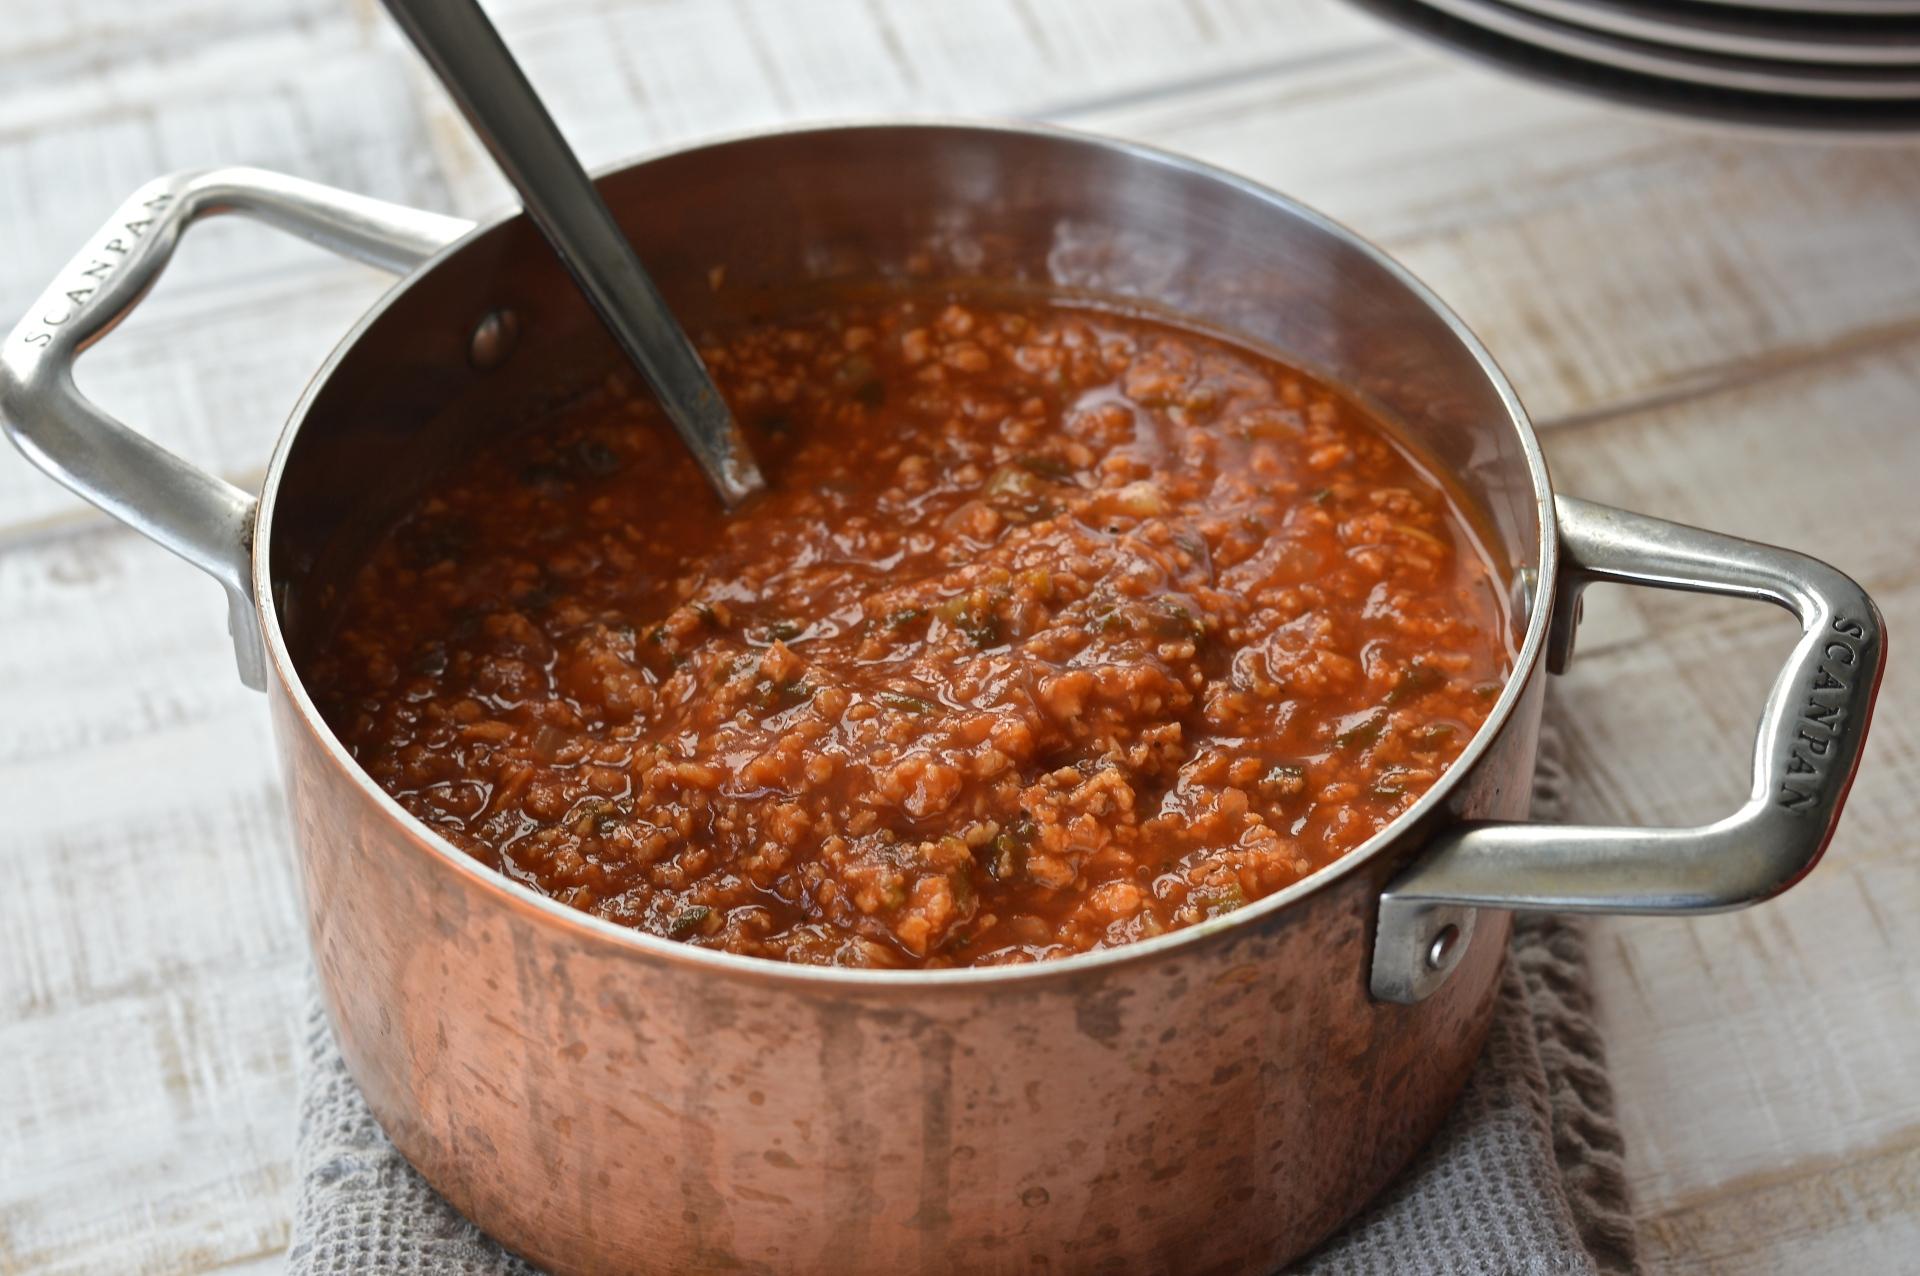 Hydrated soya (TVP) Bolognese sauce